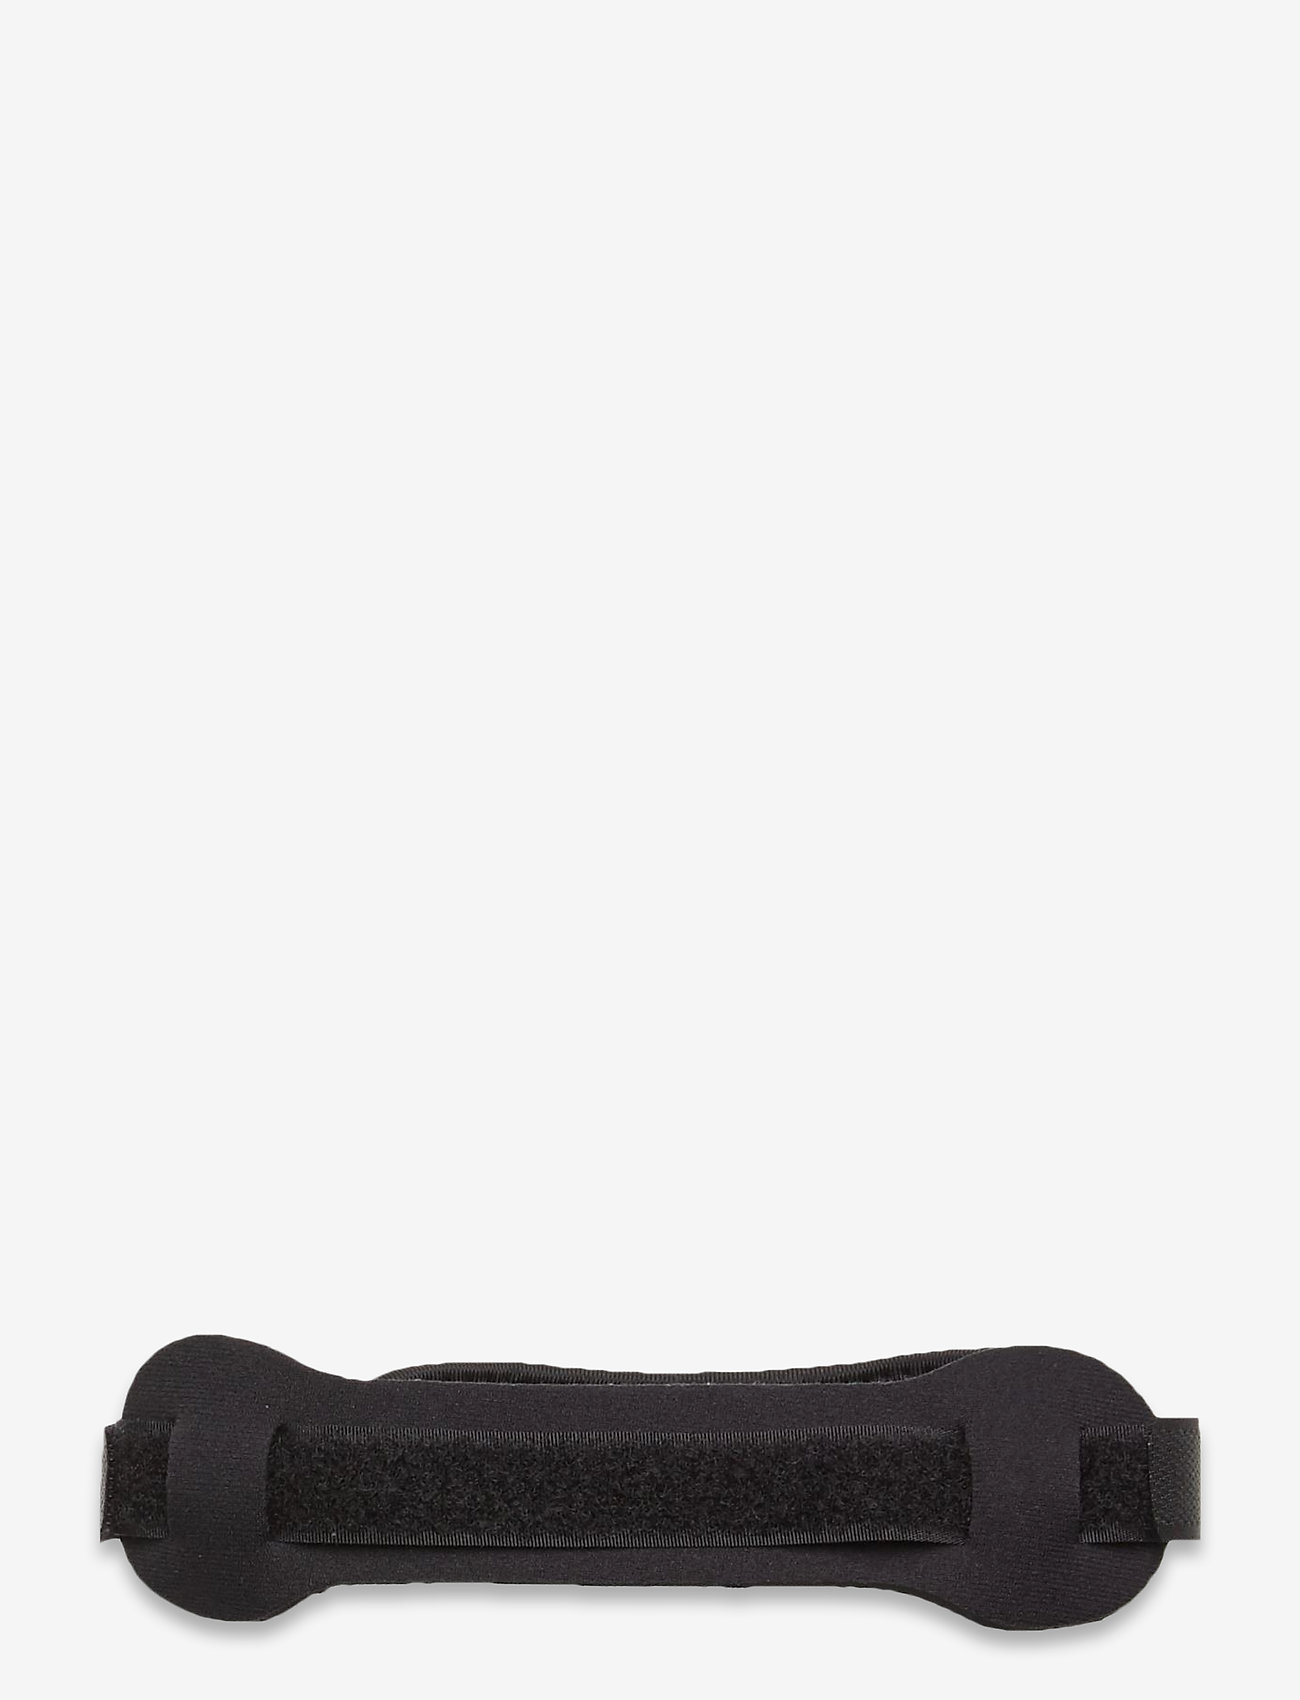 Endurance - PROTECH Knee Strap - knee support - 1001 black - 1